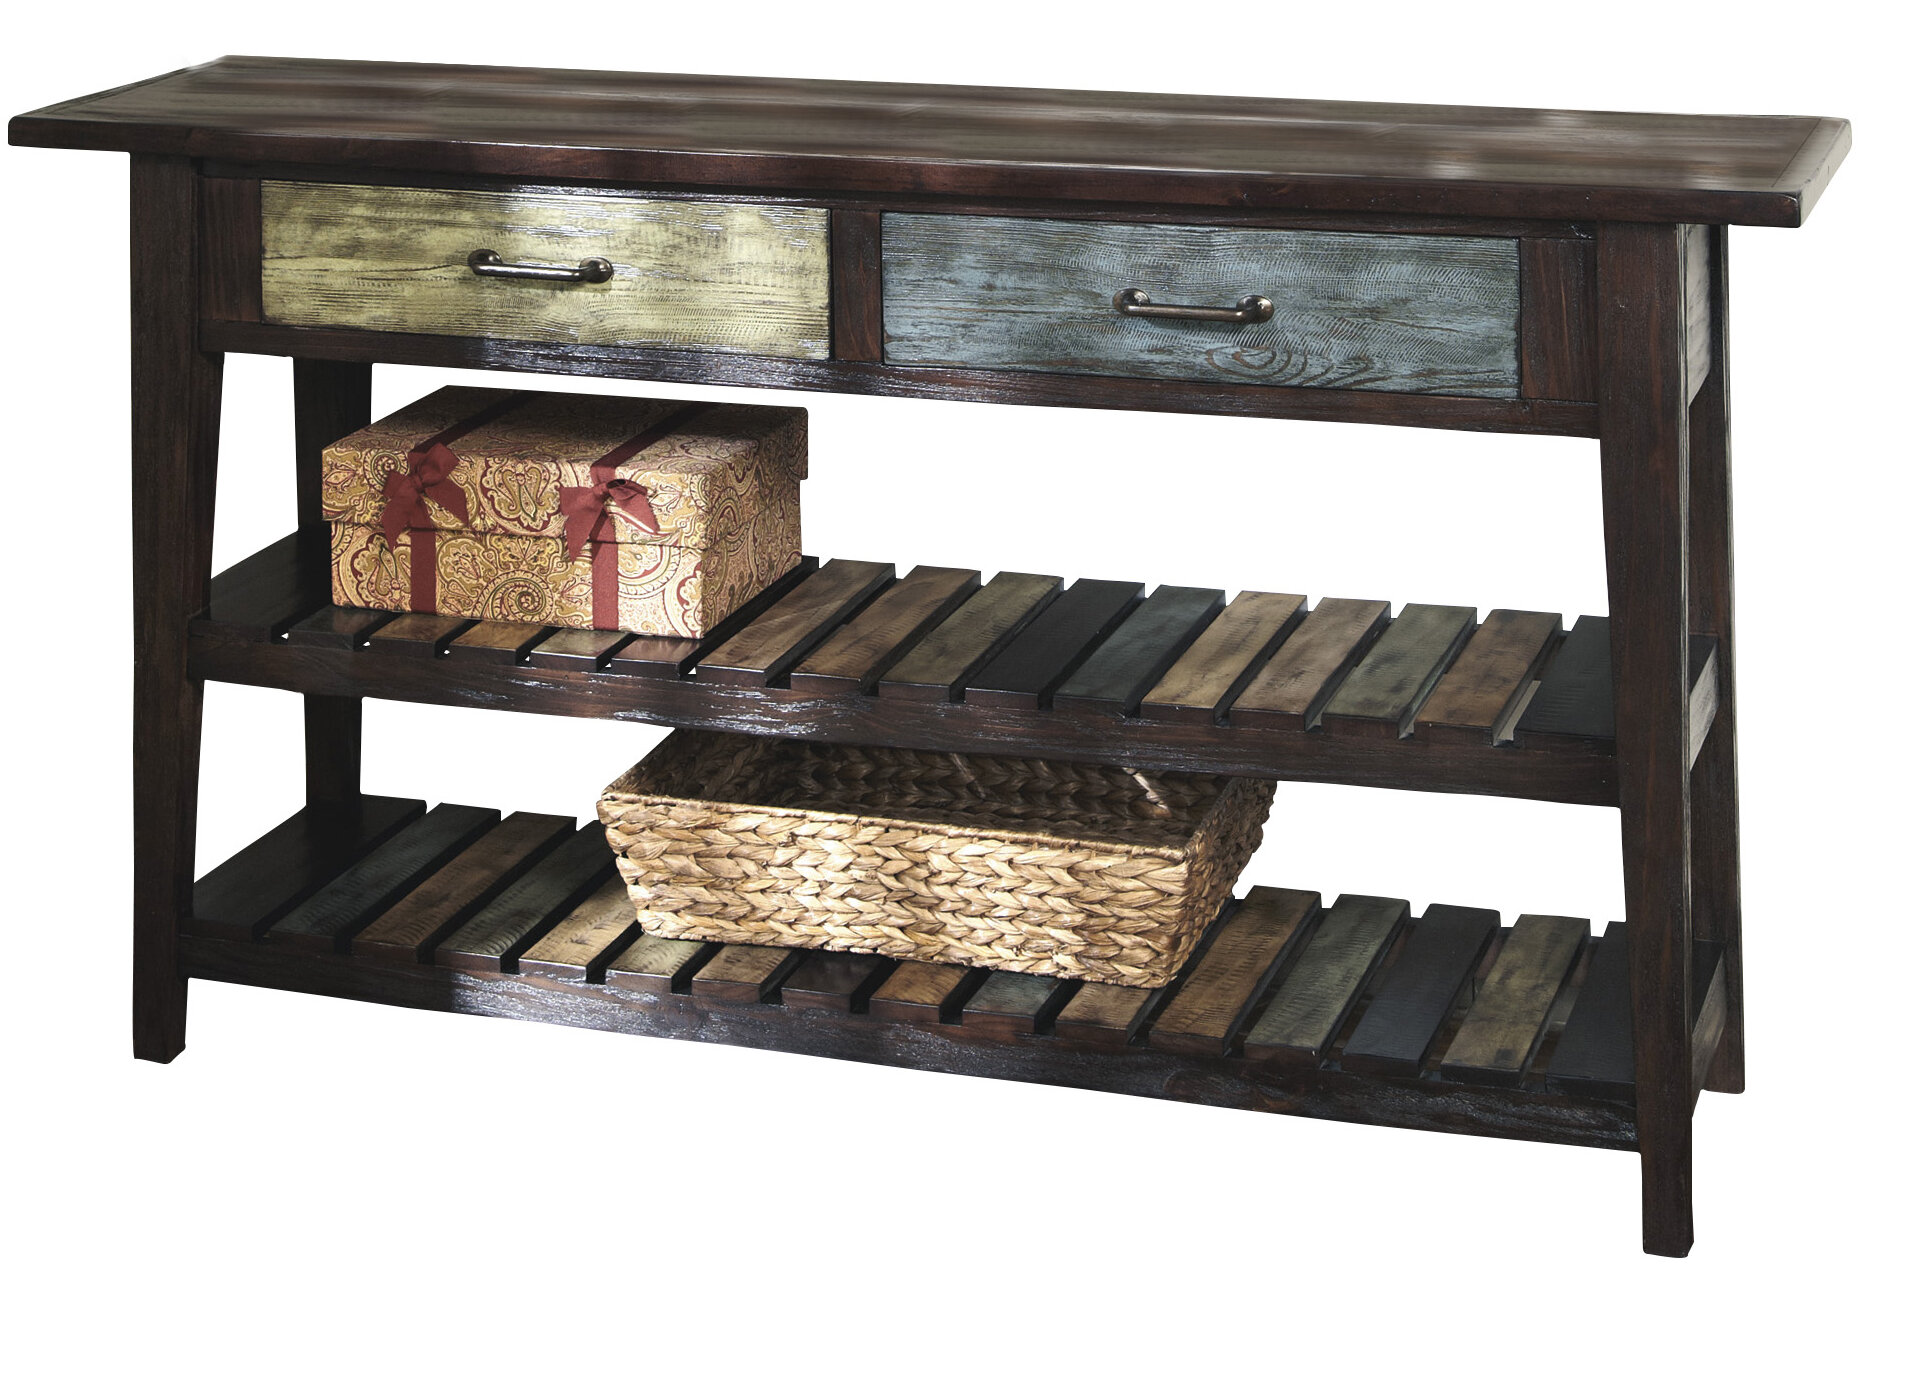 August Grove Lexington Console Table U0026 Reviews | Wayfair